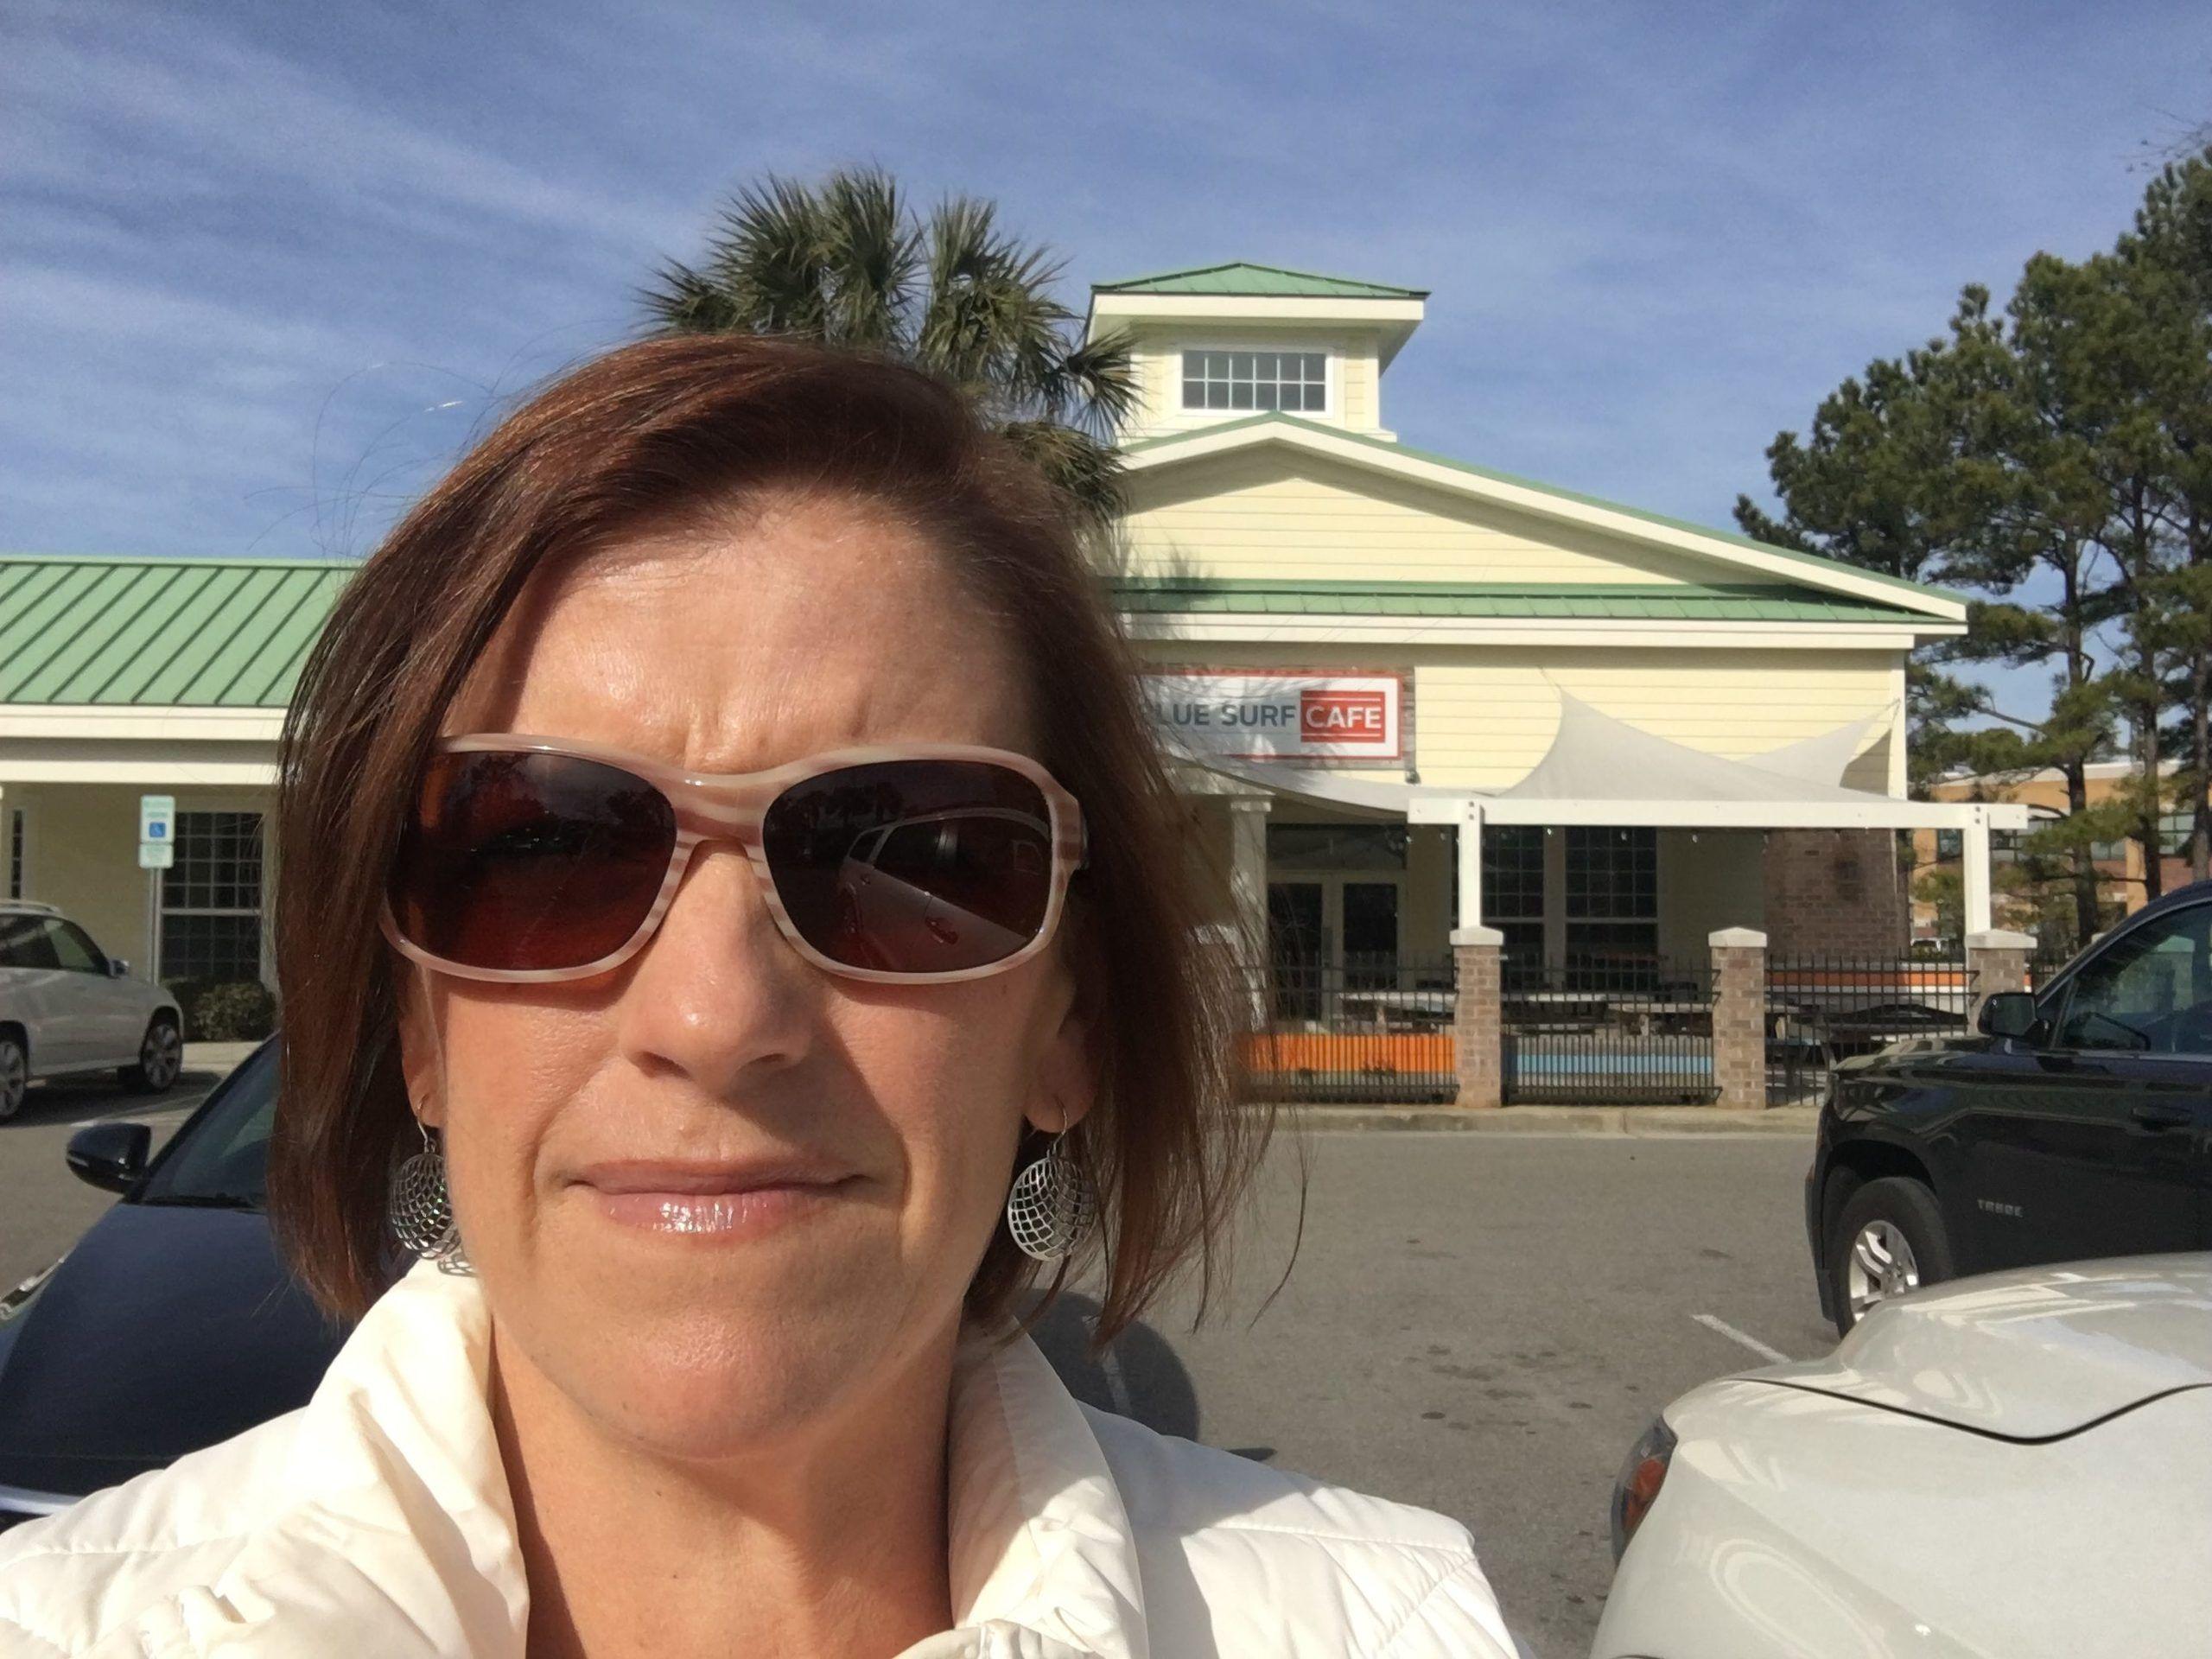 Melanie Cameron at Blue Surf Cafe